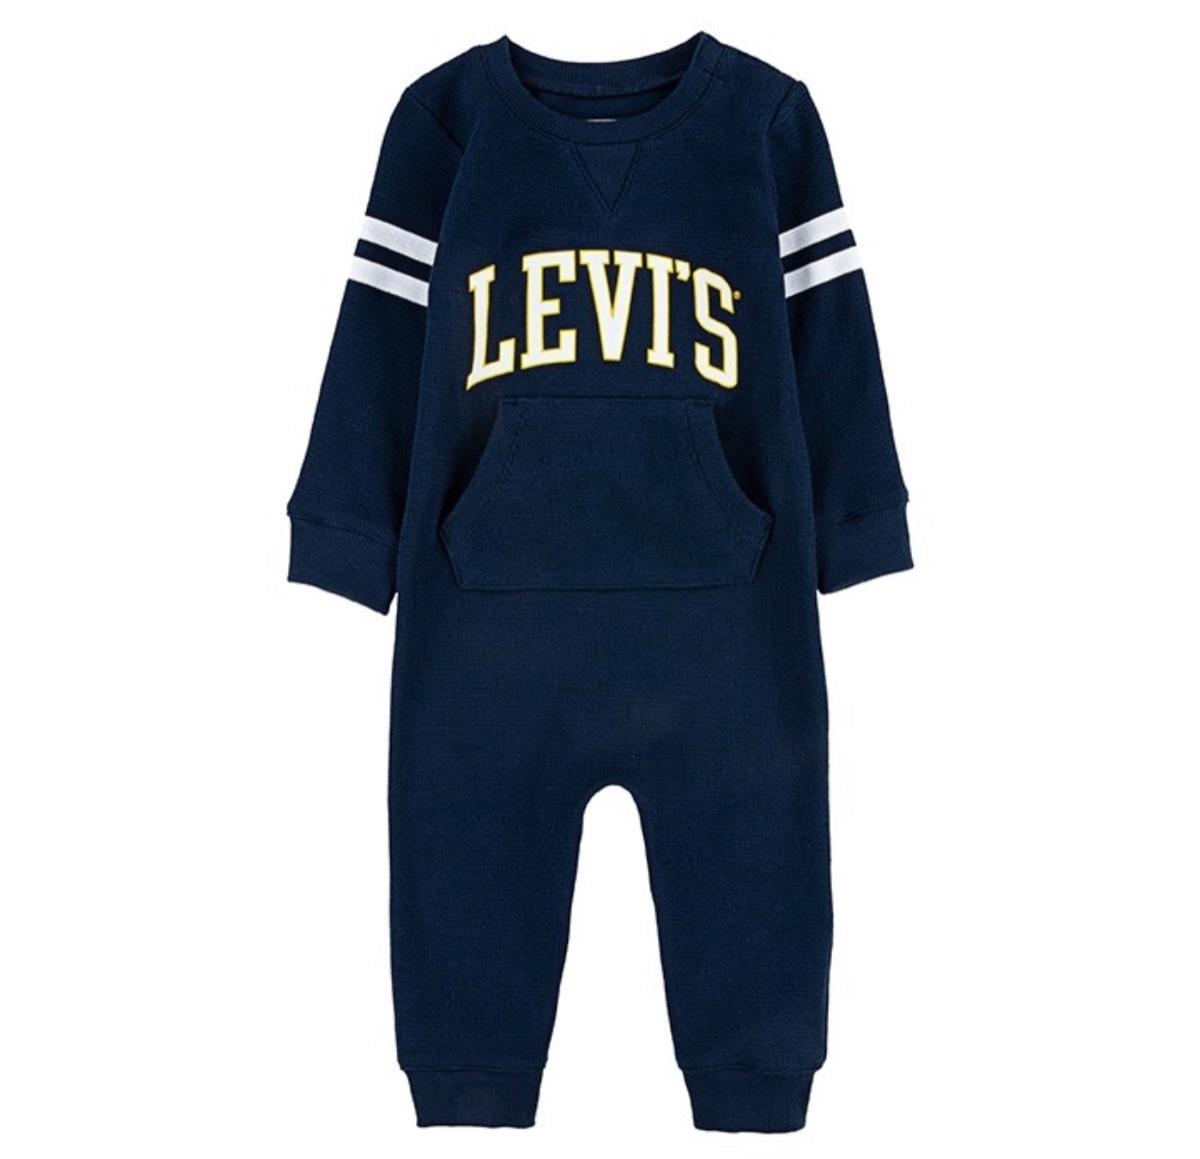 LEVIS אוברול כחול תינוקות מידות NB-9M